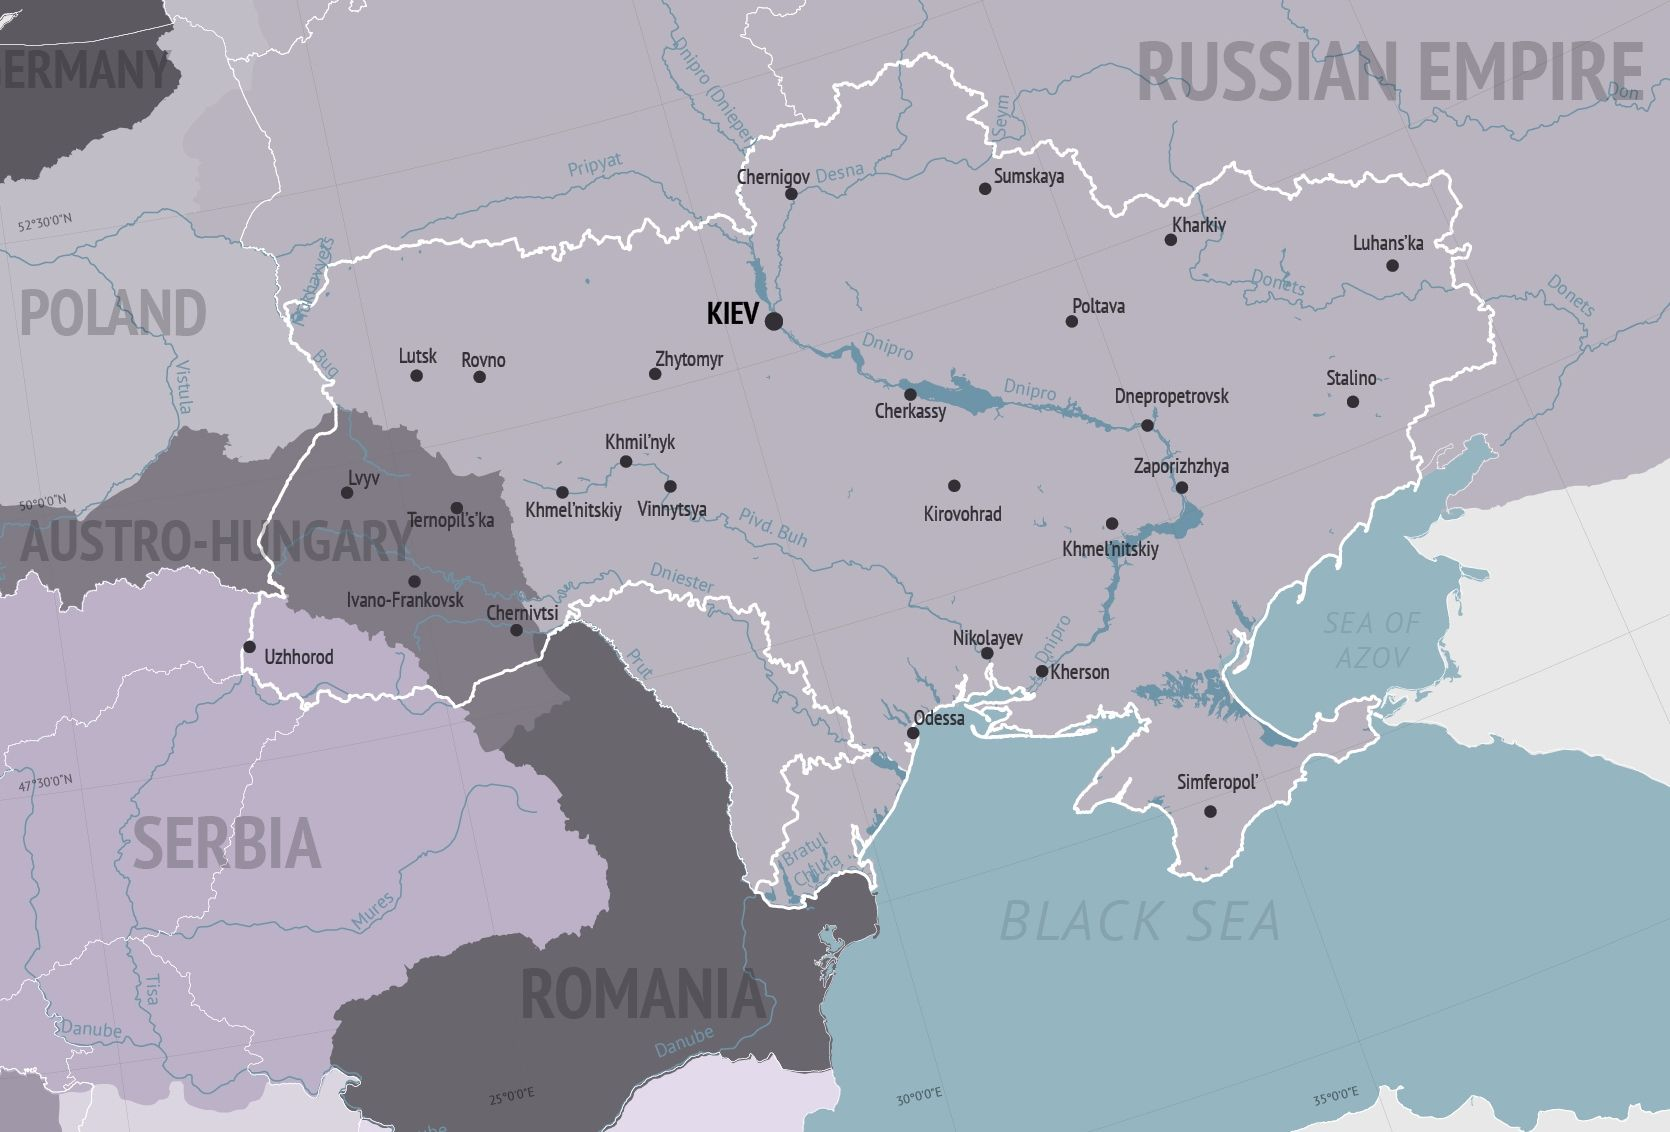 ukraine map 1900 Ukraine Map Story my family tree Pinterest